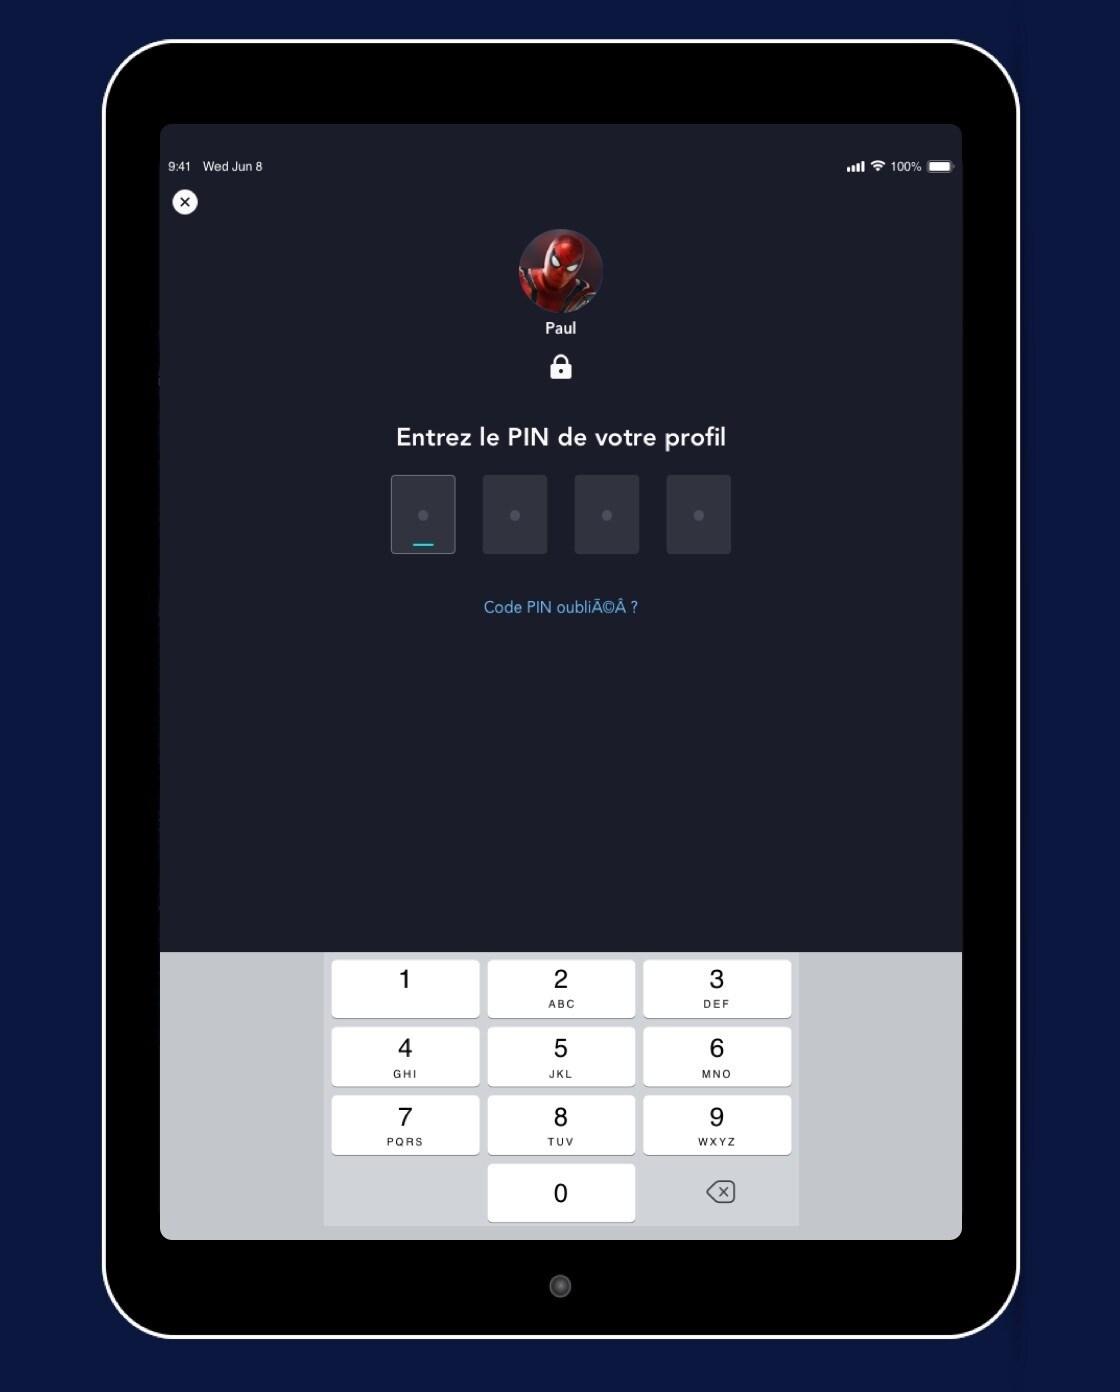 L'écran du code PIN de Disney+ dans les paramètres du profil